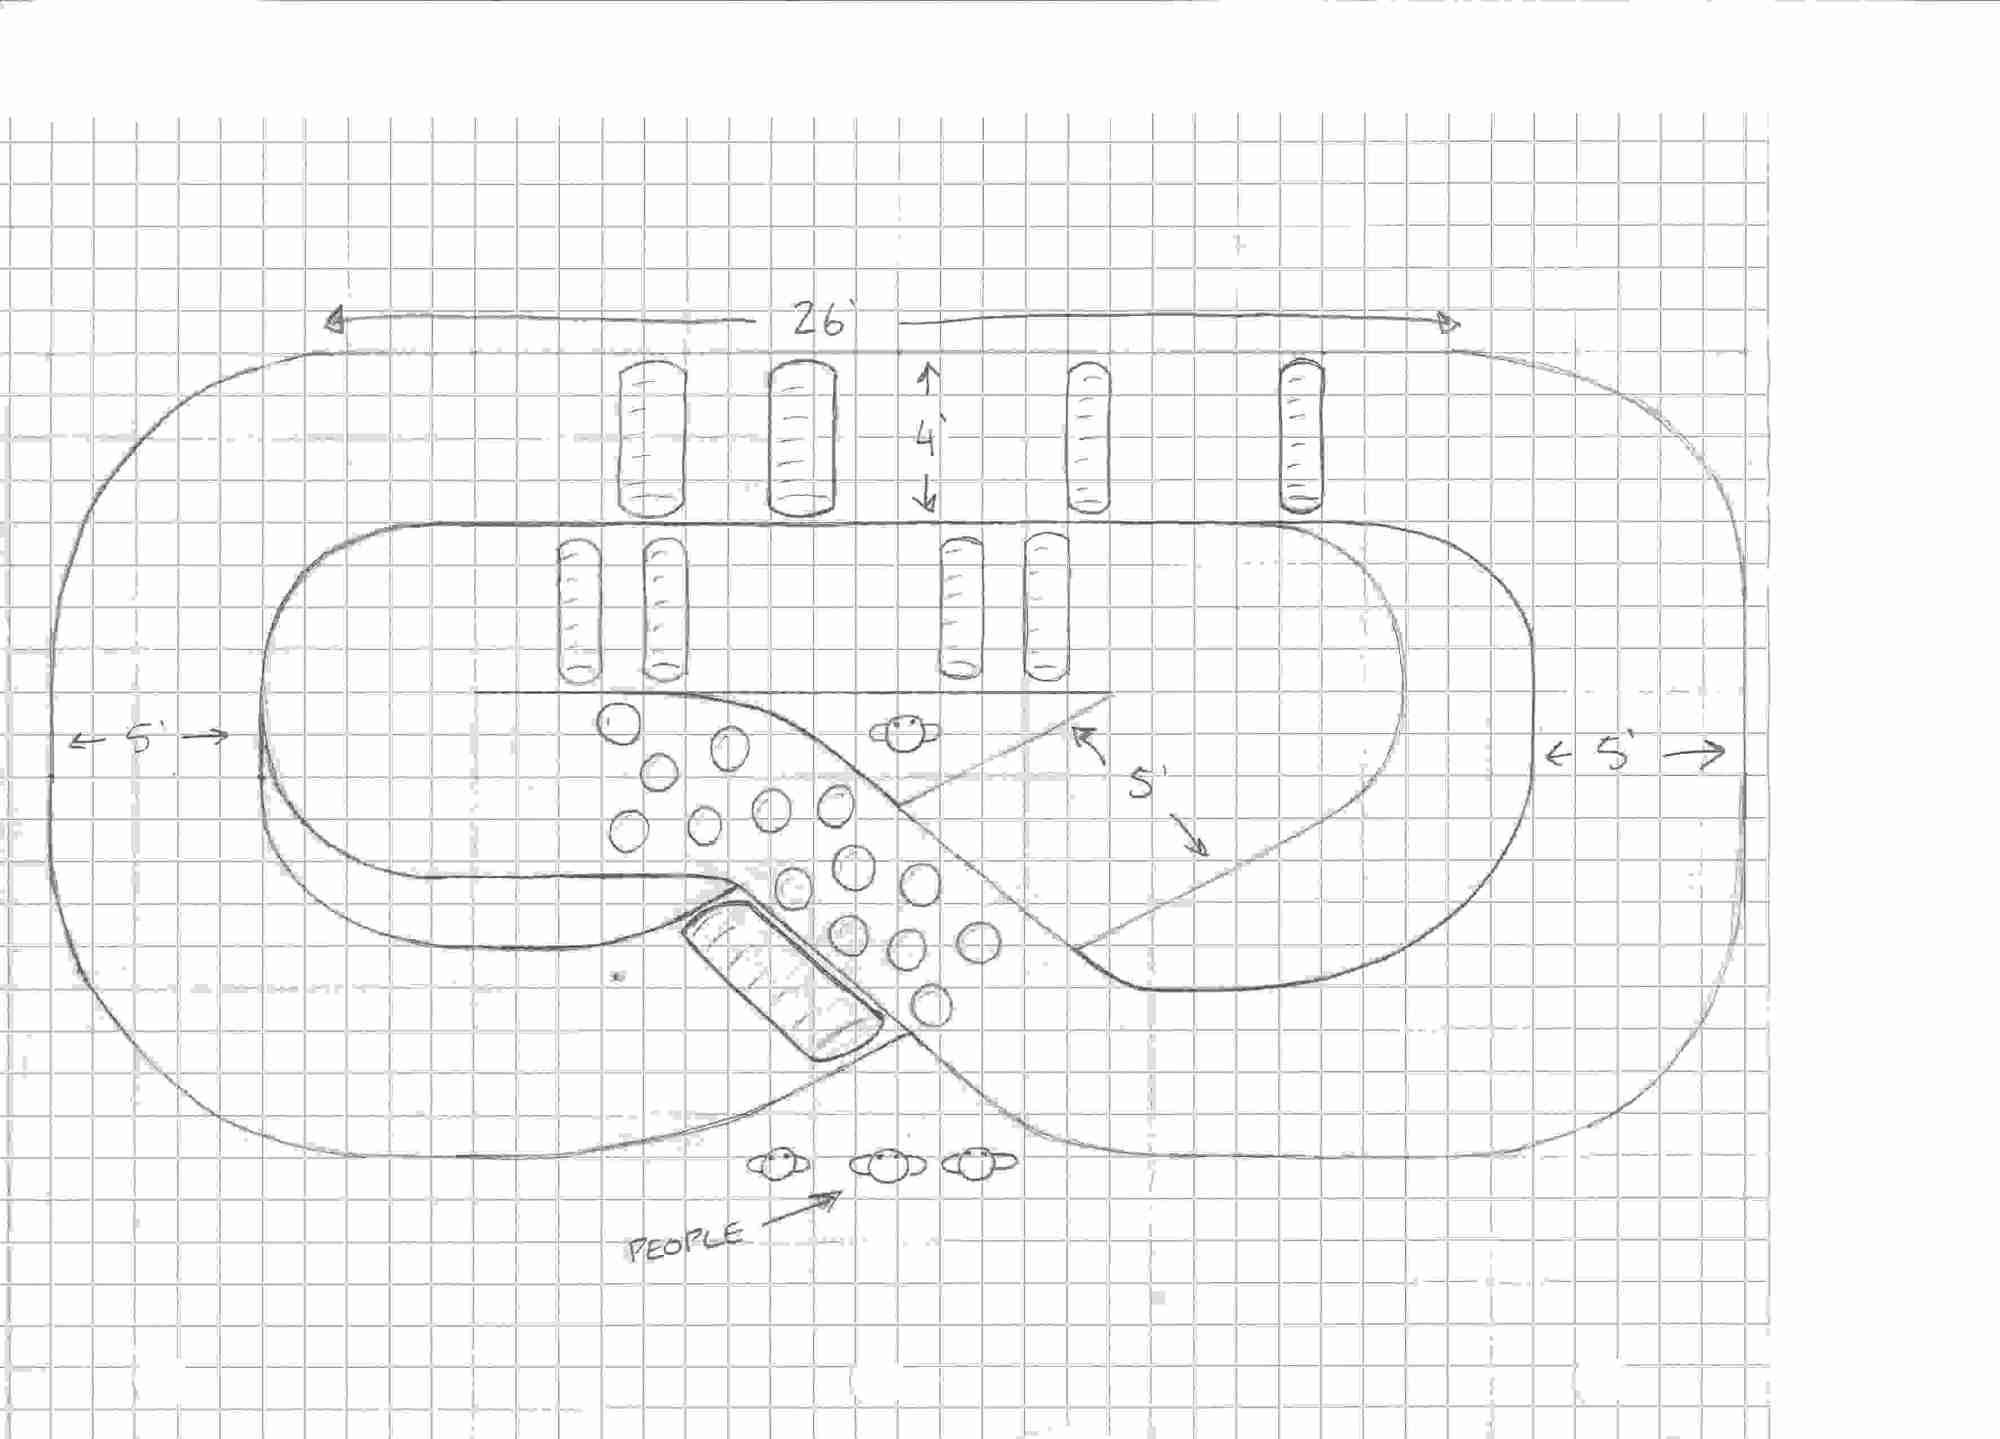 hight resolution of  2012 vw jetta fuse box diagram volkswagen jetta fuse diagram also wiring diagram for vw lt35